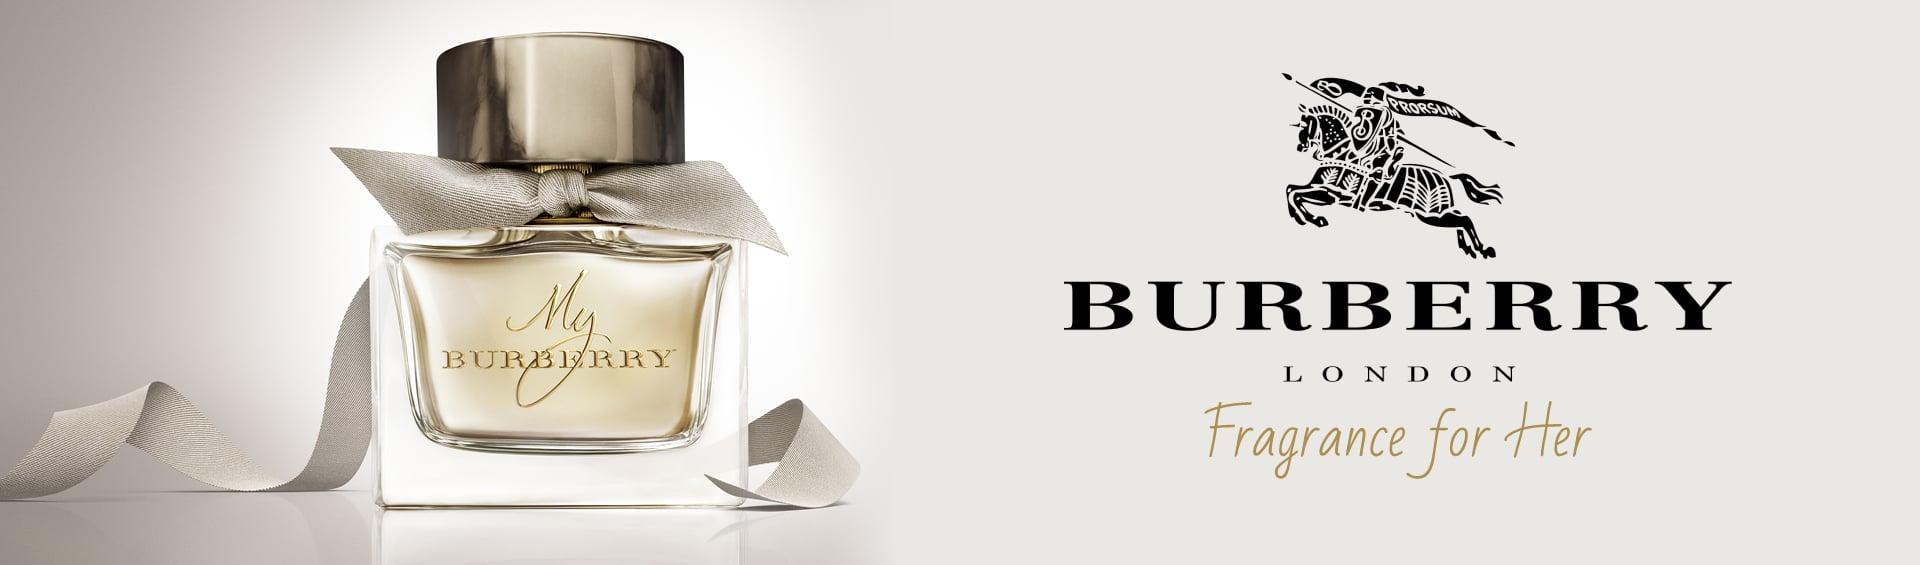 burburry perfume in egypt